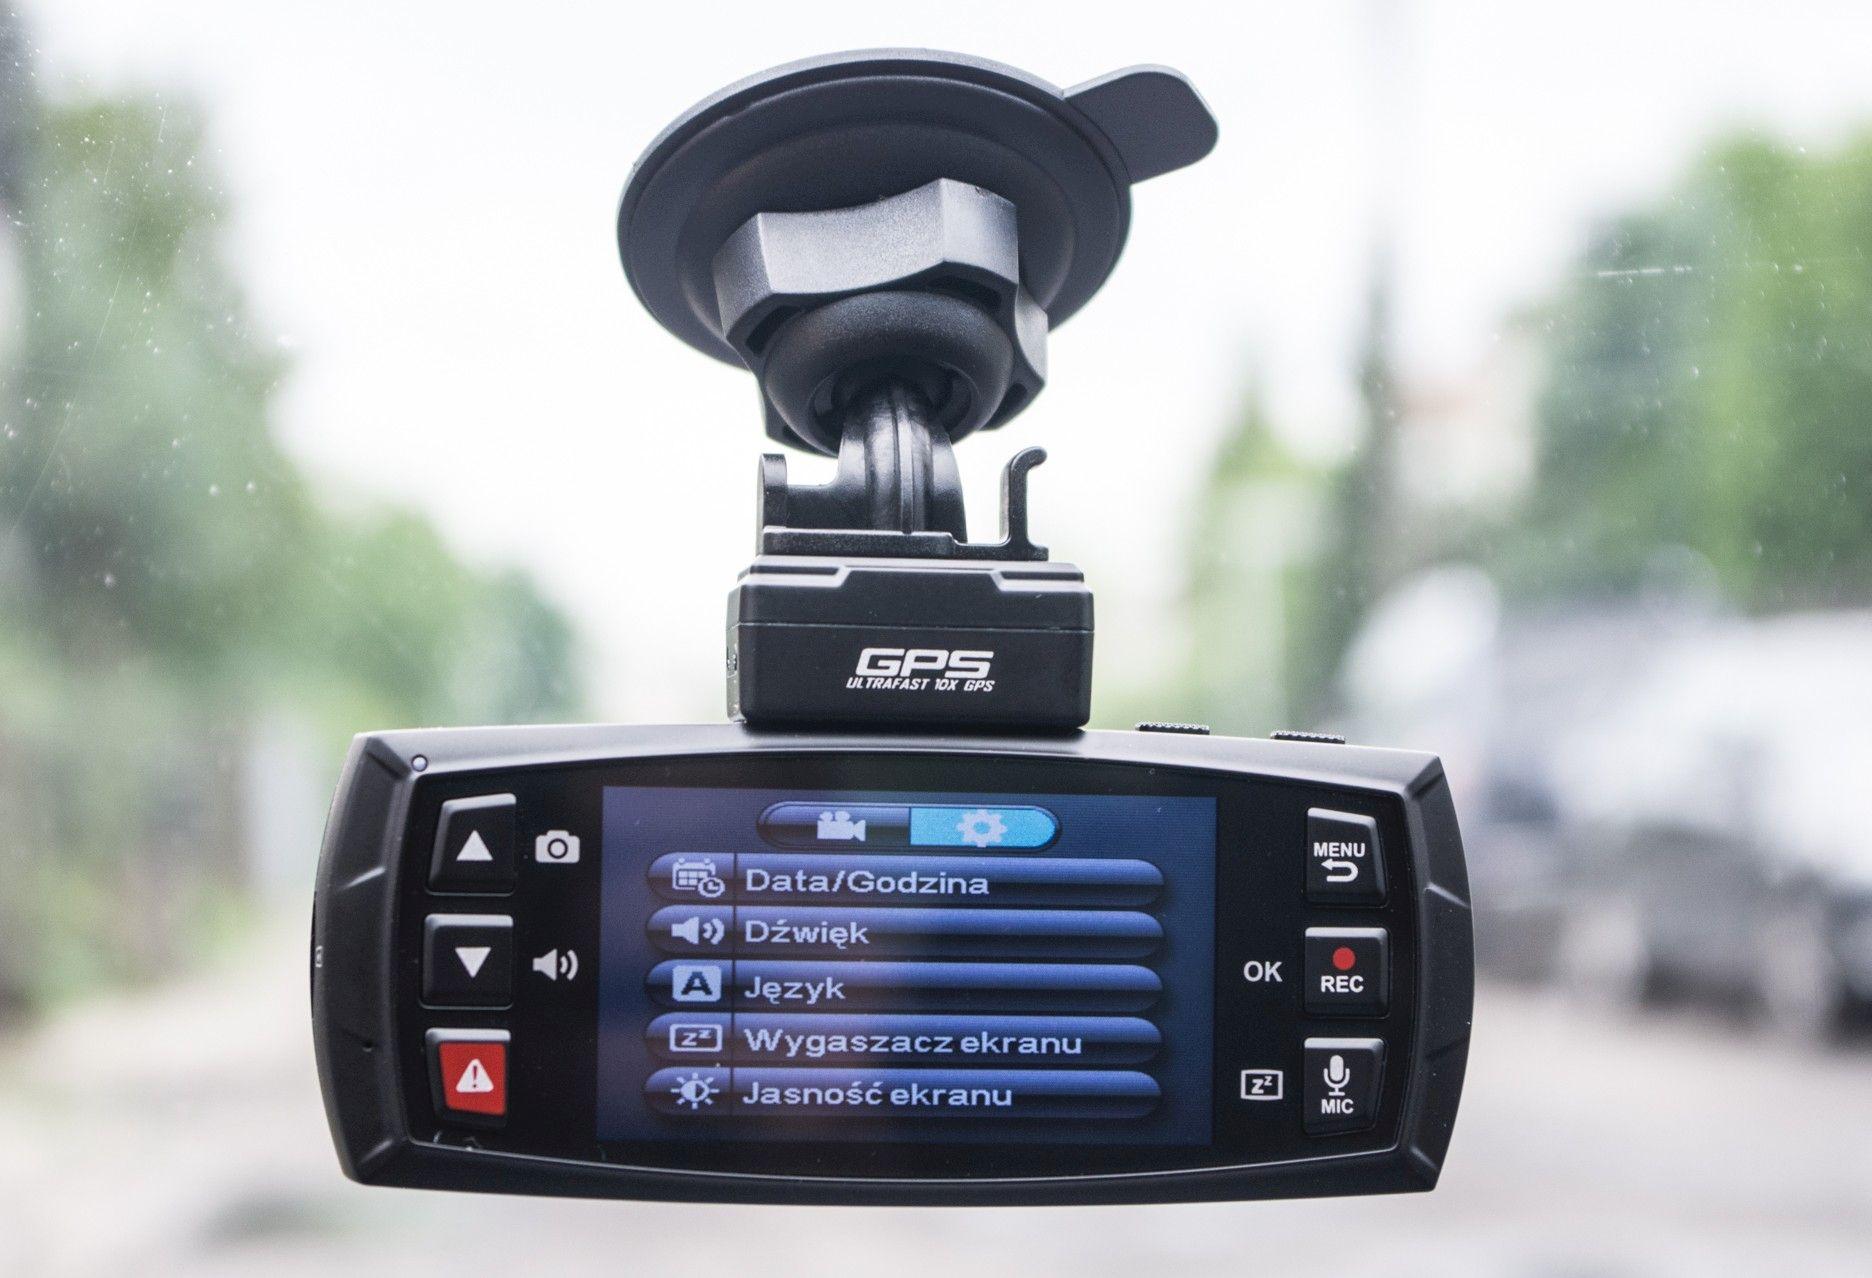 DOD LS470W GPS ustawienia menu